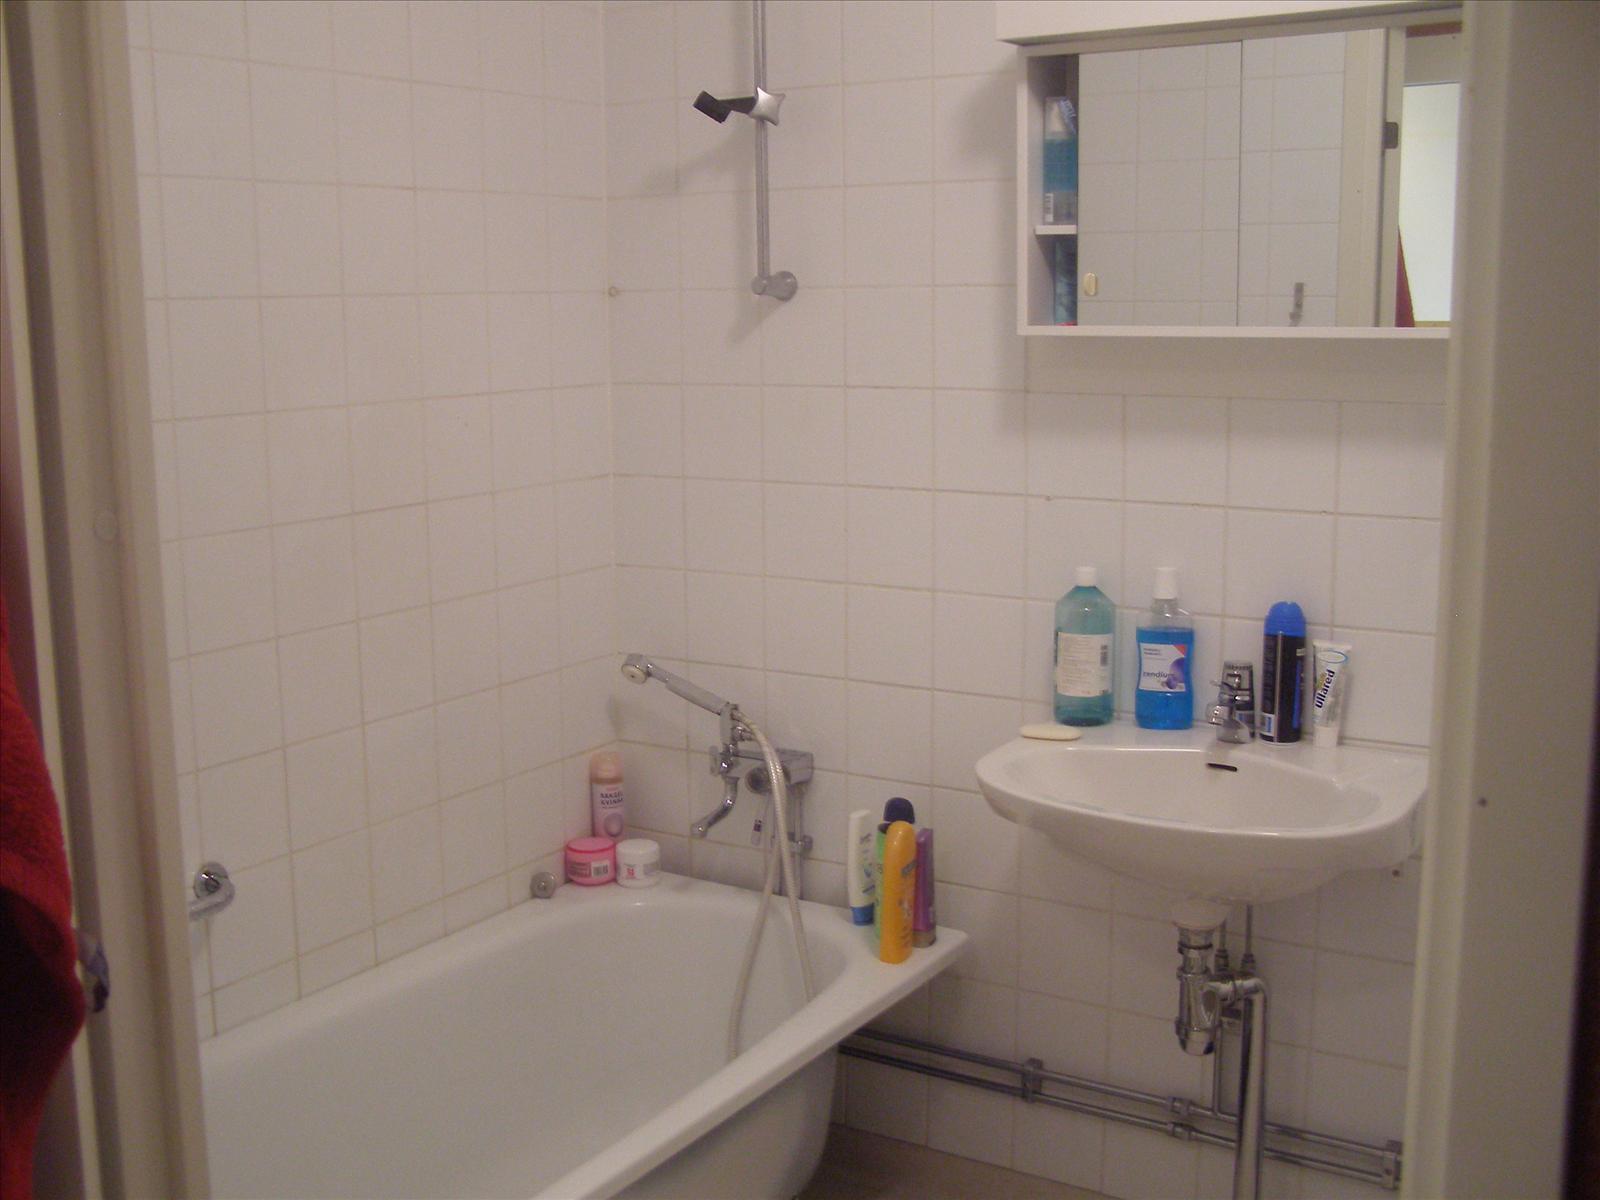 Kakeldekorer i badrummet?   inredning och design   hemmet ifokus